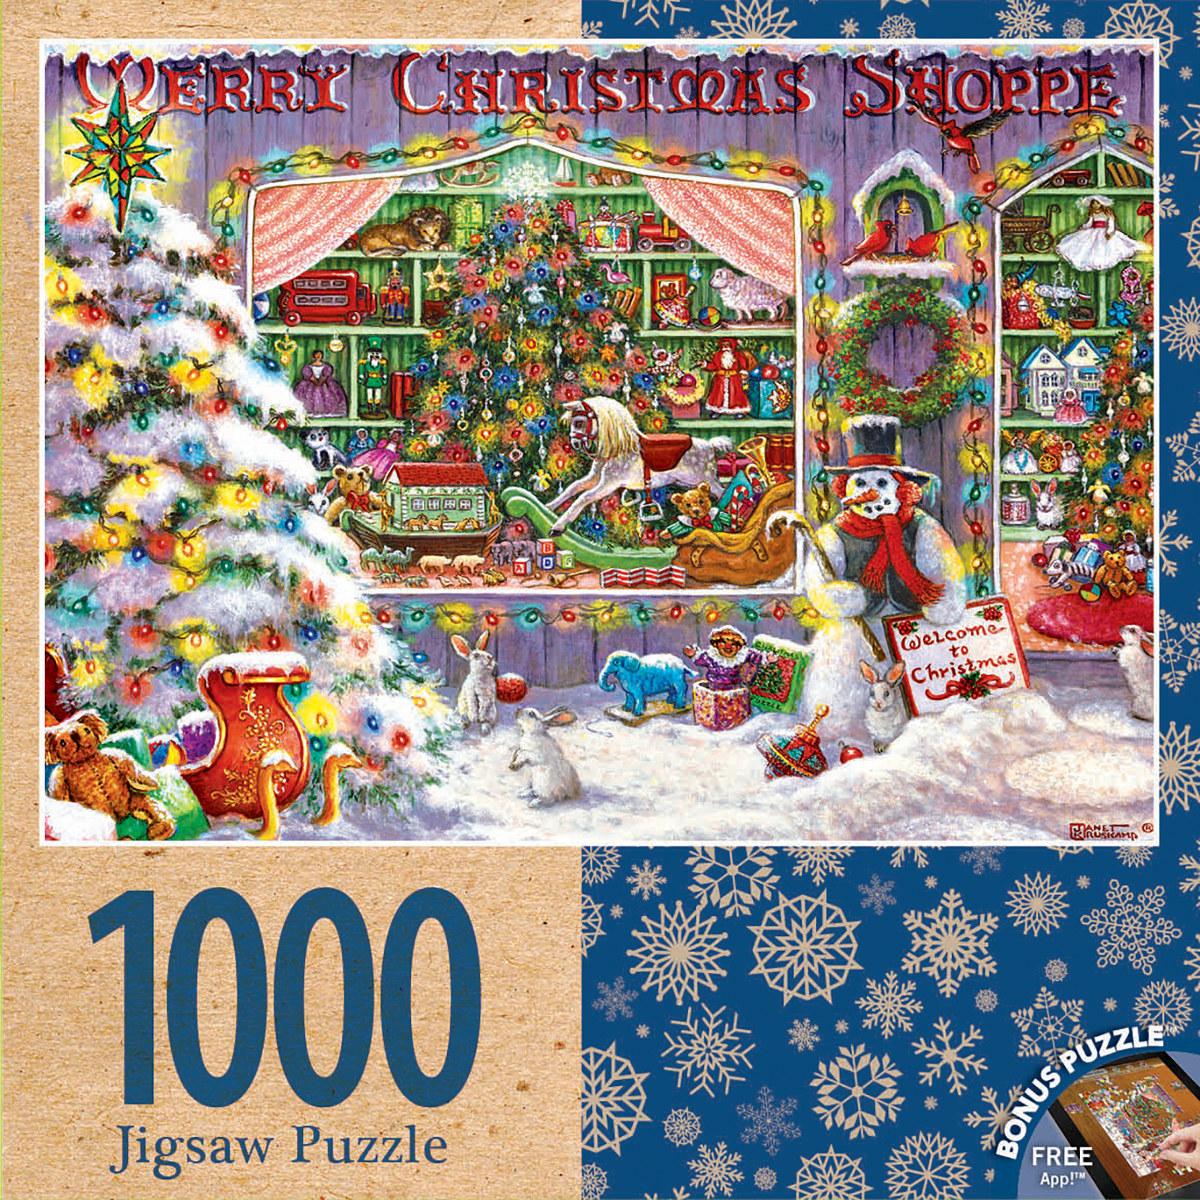 d70a49326115 Merry Christmas Shop Jigsaw Puzzle | PuzzleWarehouse.com